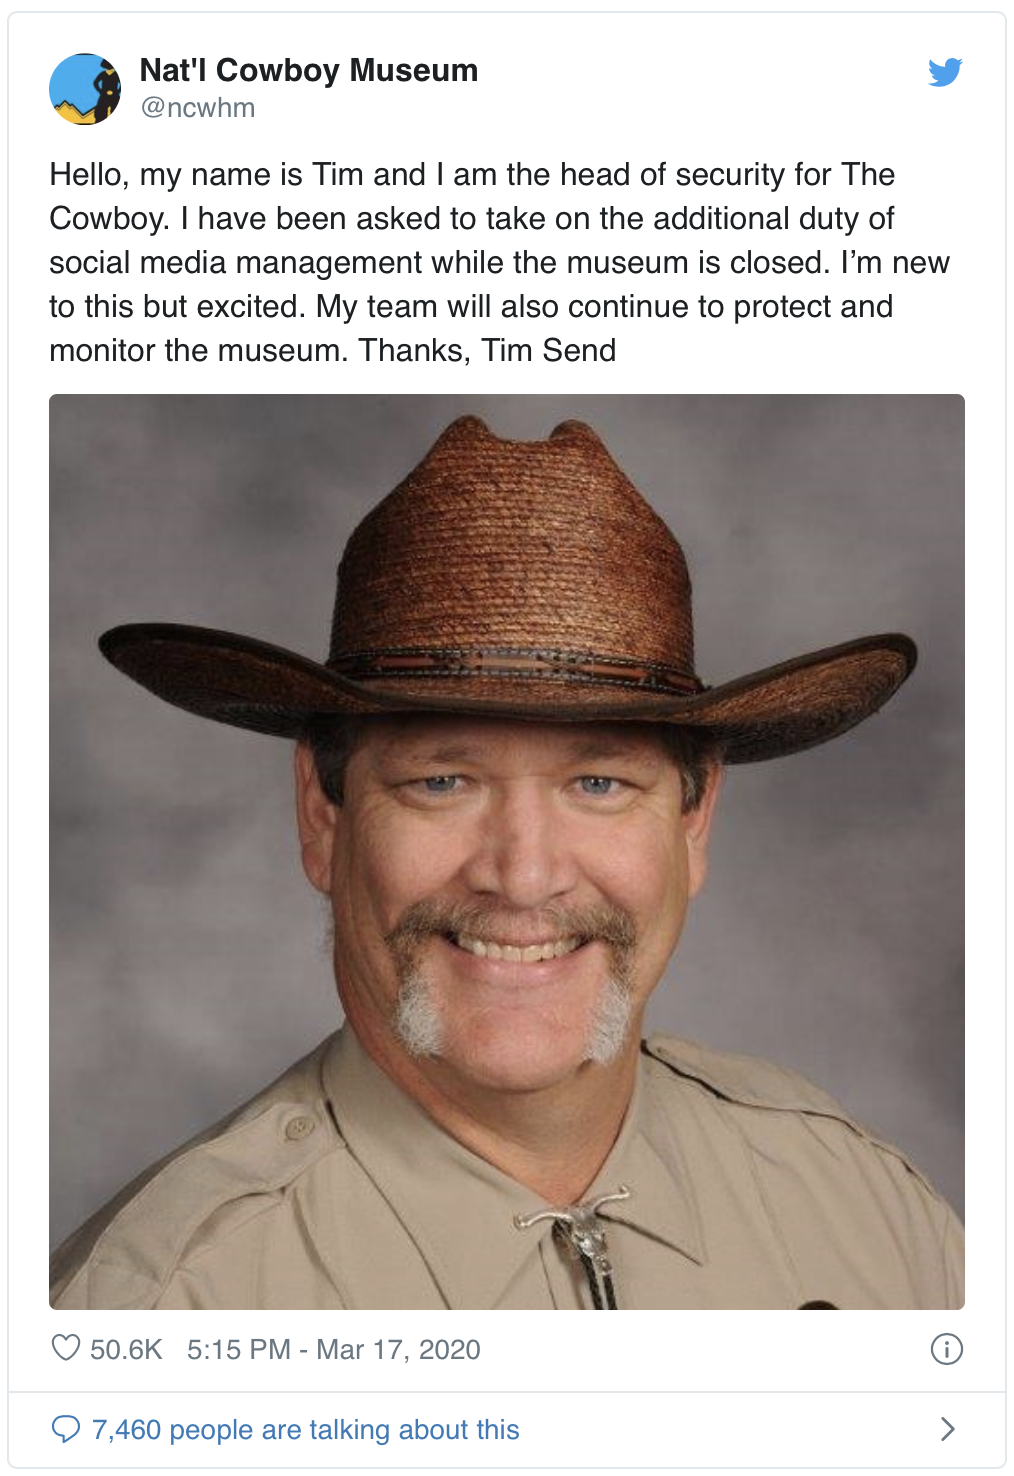 National Cowboy Museum